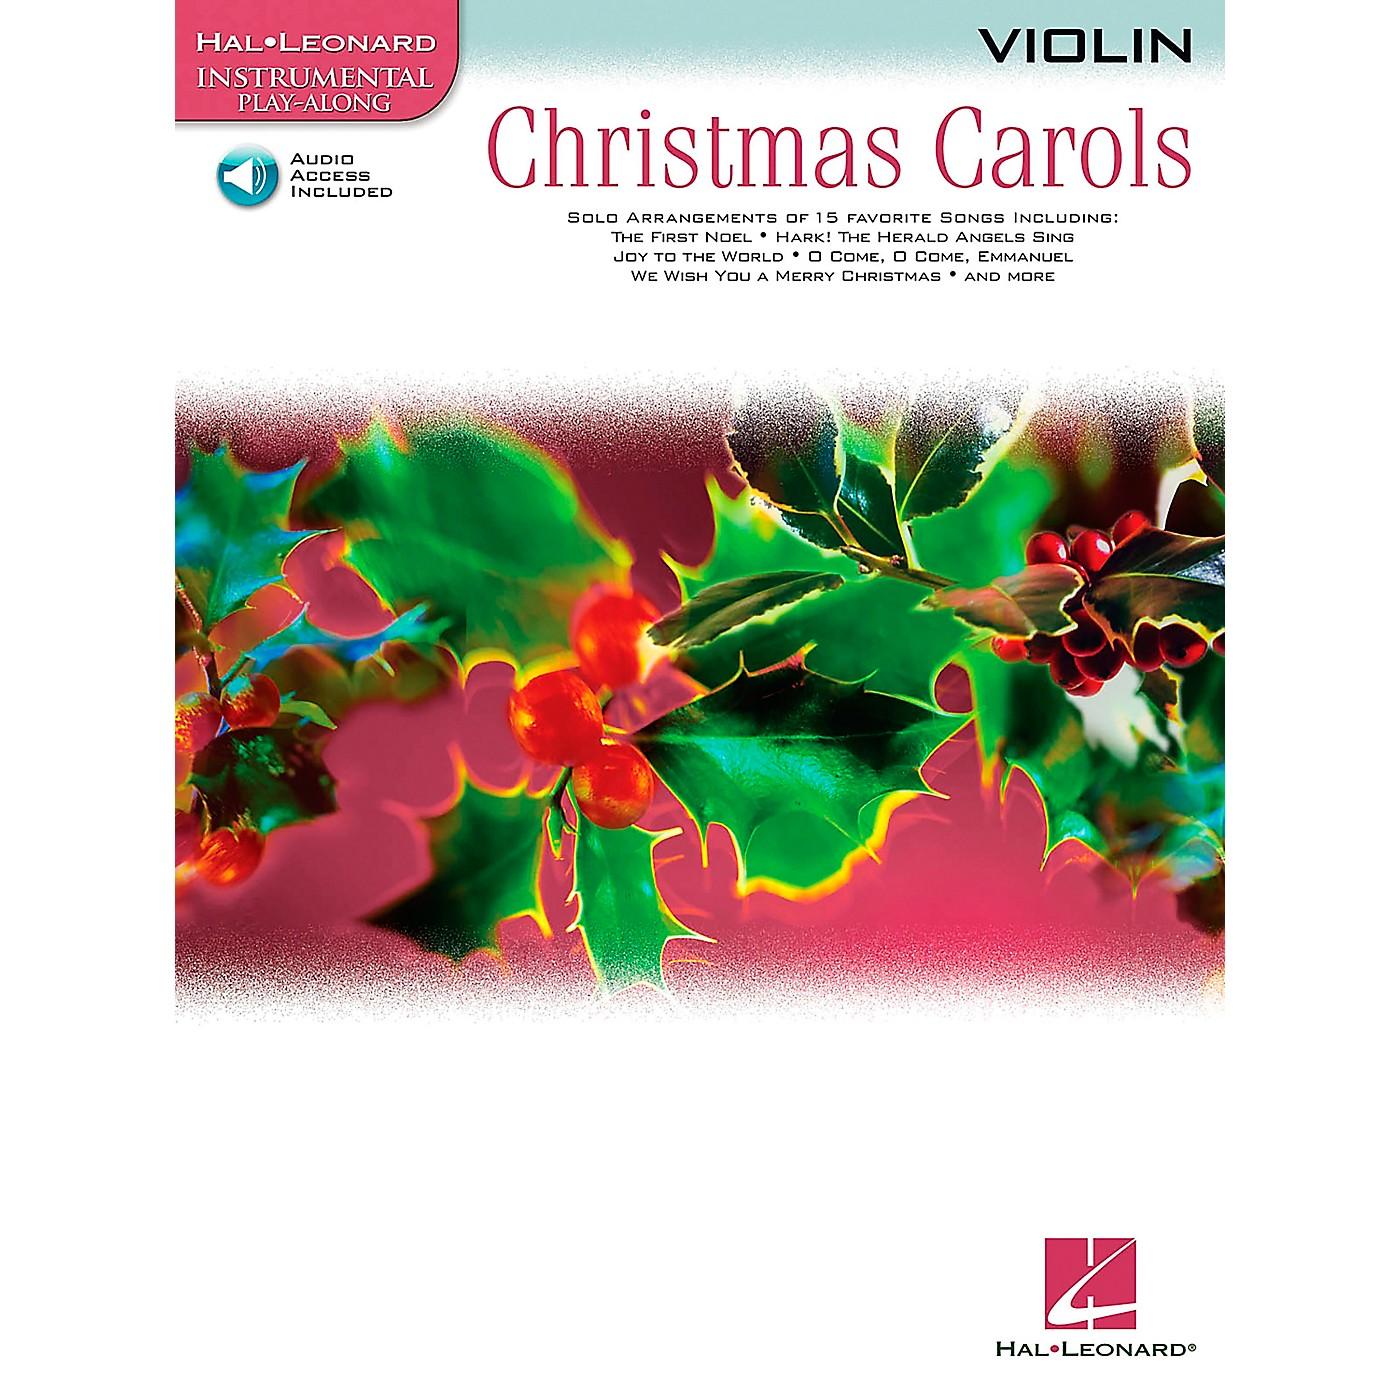 Hal Leonard Christmas Carols for Violin Book/CD thumbnail